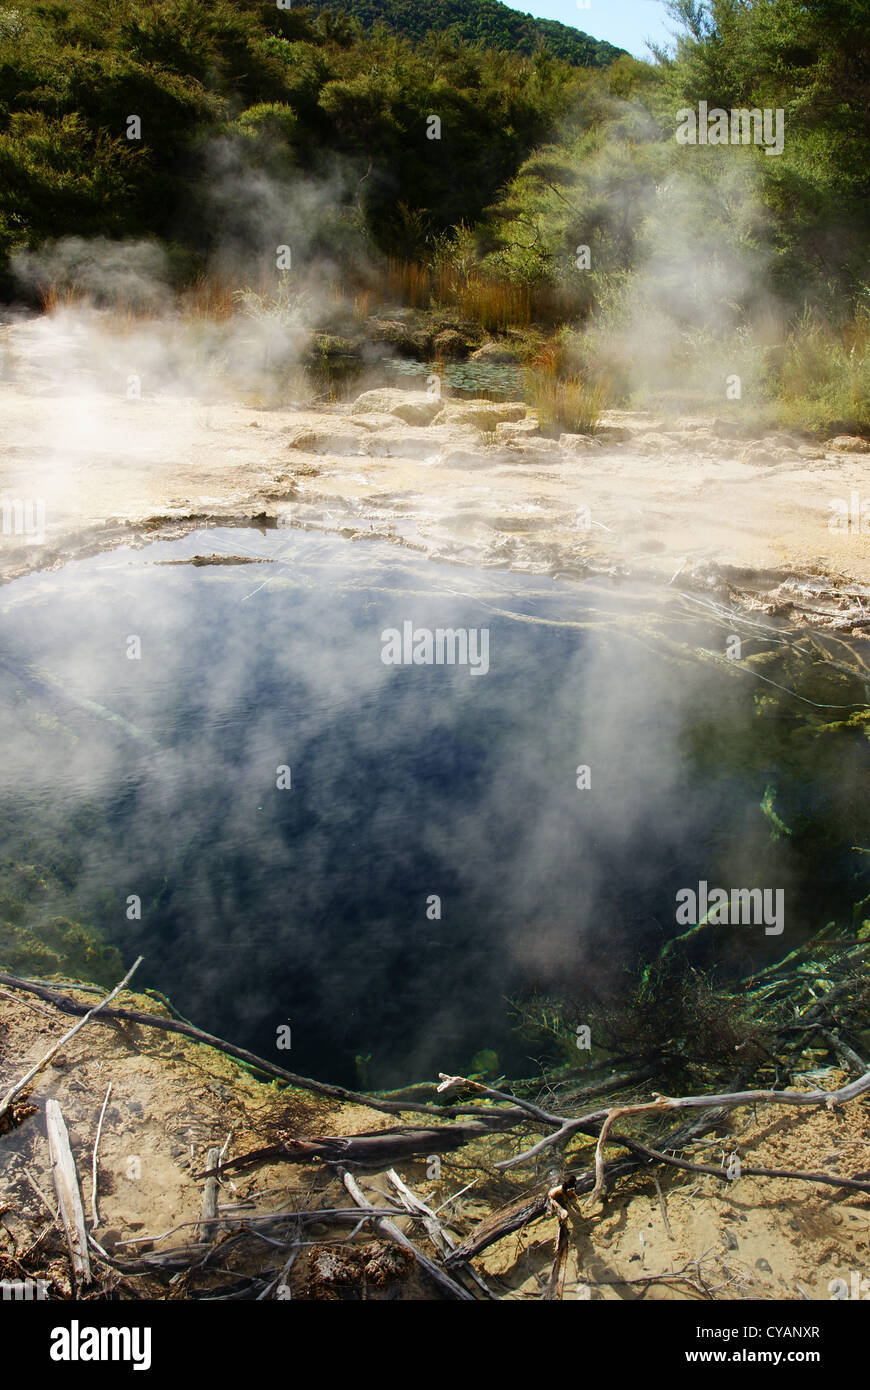 Thermal Pools at Tokaanu, Turangi, New Zealand - Stock Image